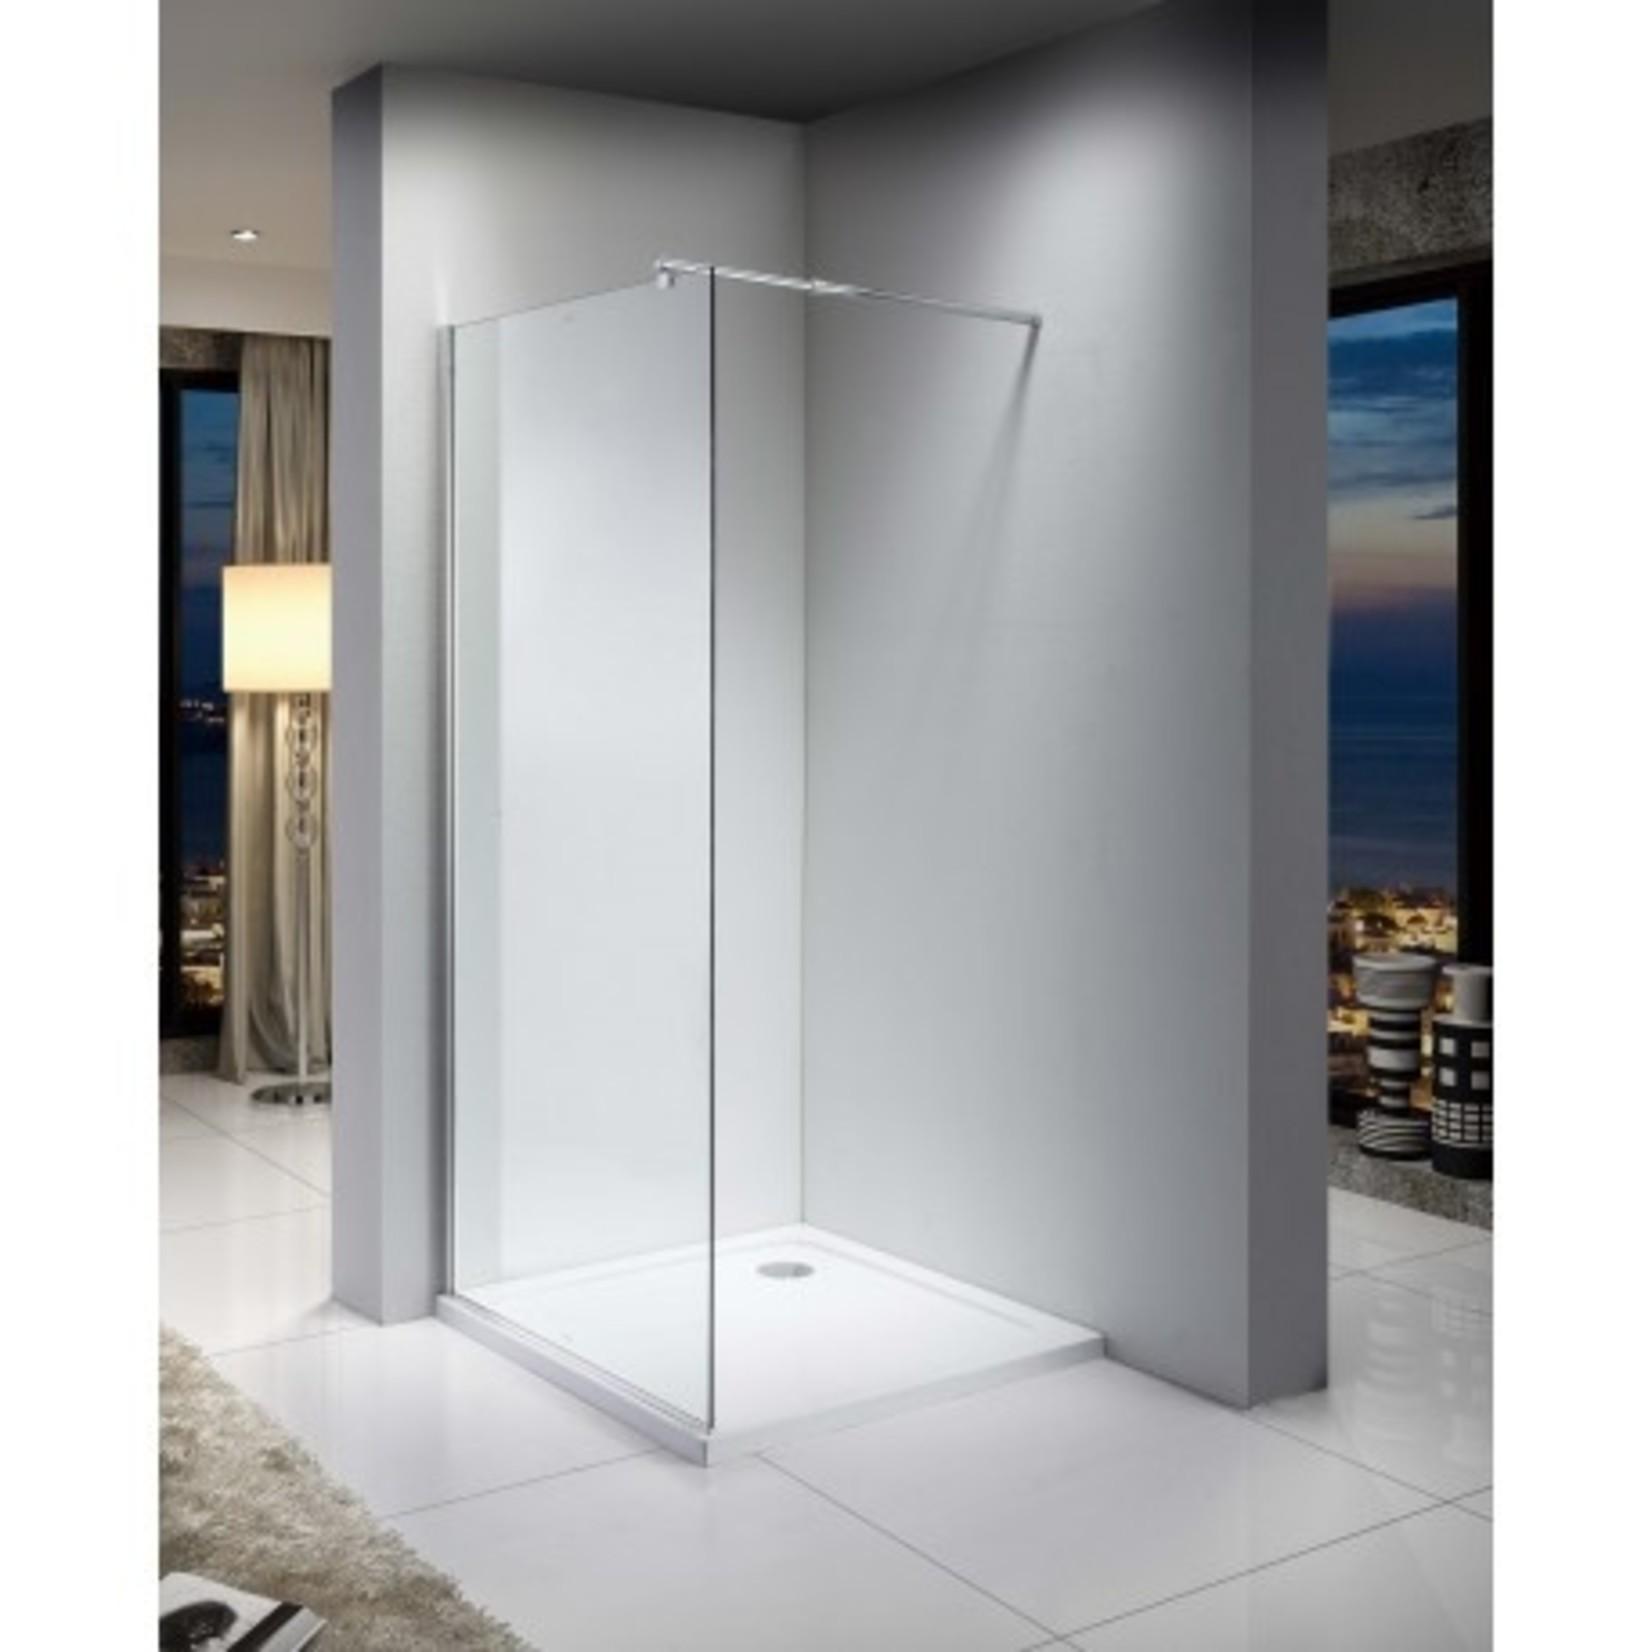 36 '' Italian style glass shower in chrome